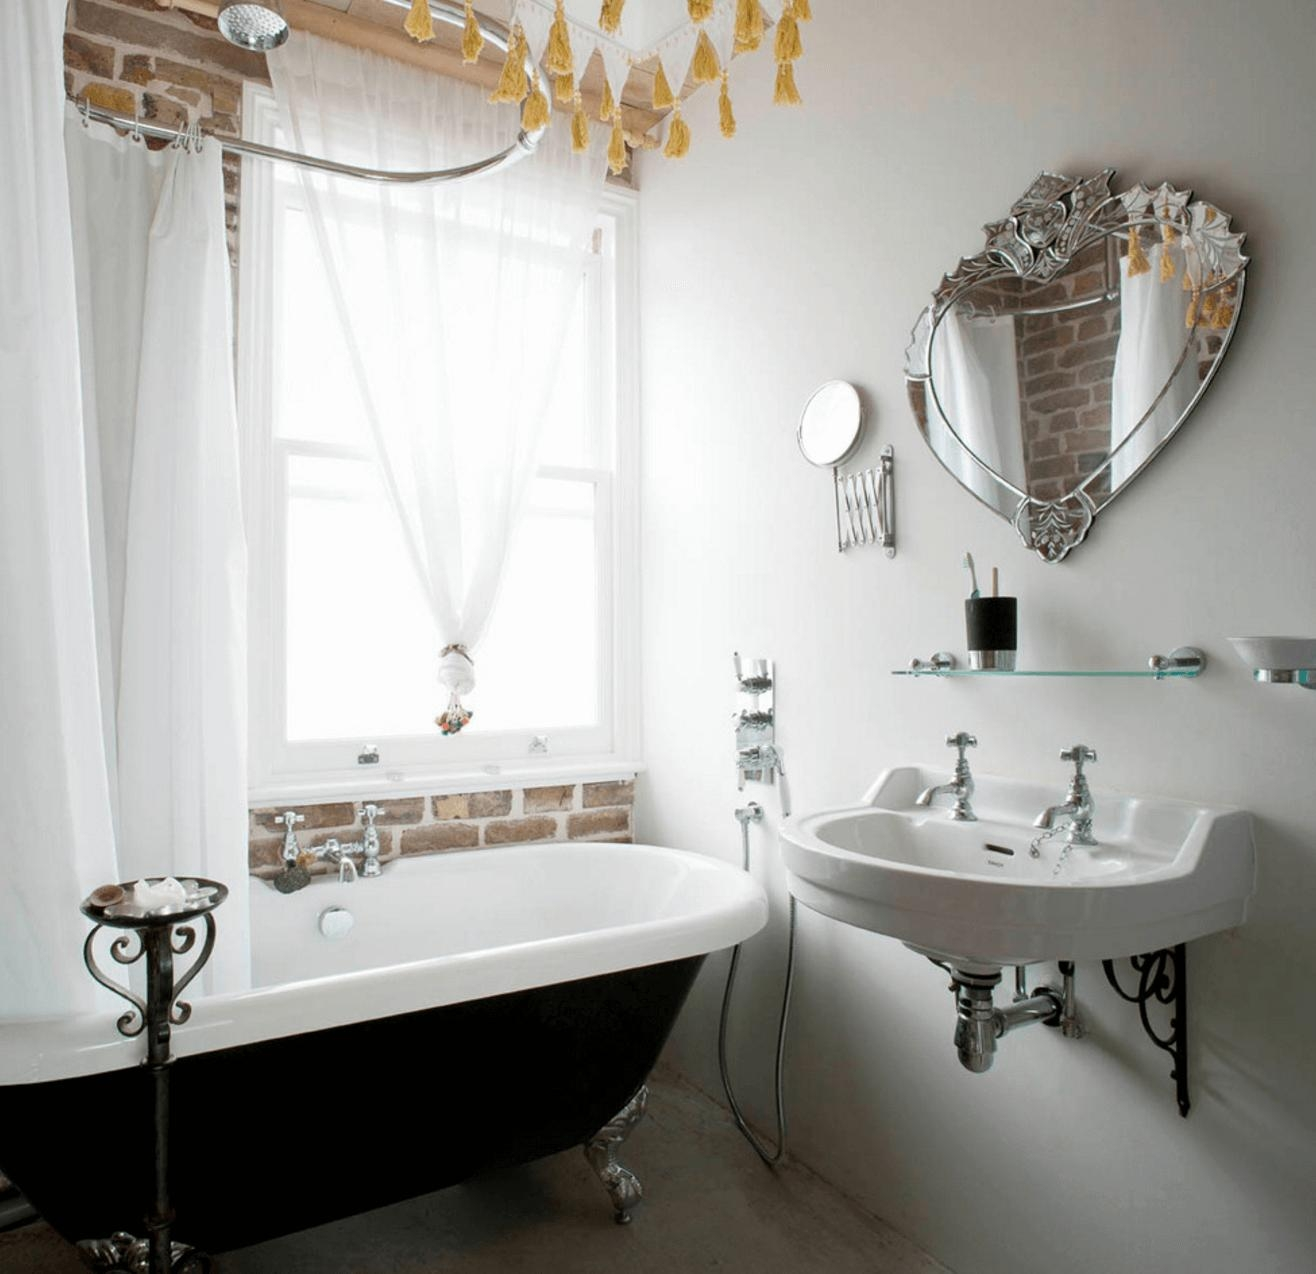 Fashionable Antique Bathroom Mirror 14 Best Vintage Light And Inside Bathroom Mirrors Vintage (Image 9 of 20)